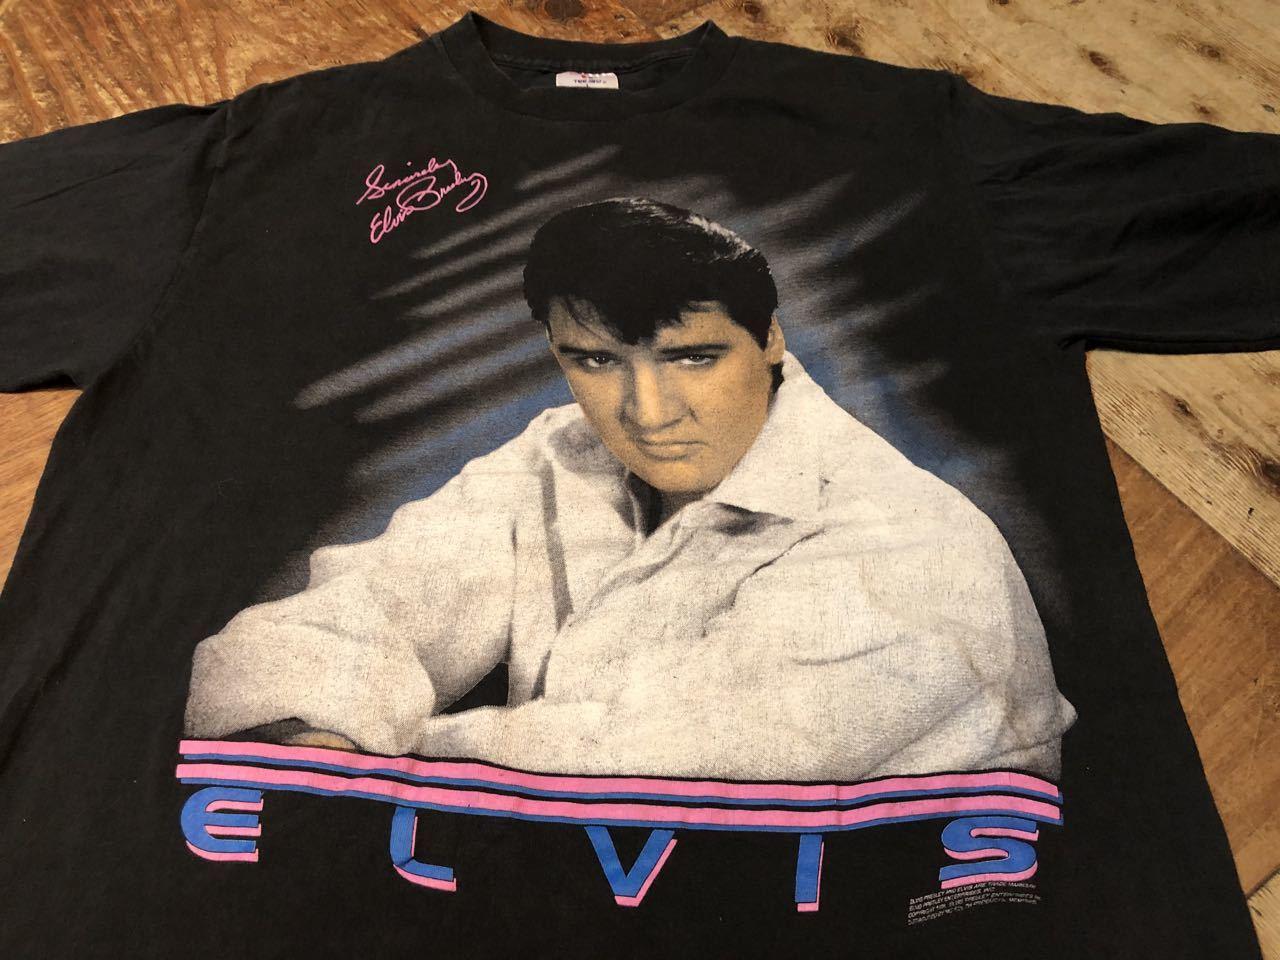 8月2日(日)入荷!90s MADE IN U.S.A ELVIS エルビス Tシャツ!_c0144020_13334249.jpg